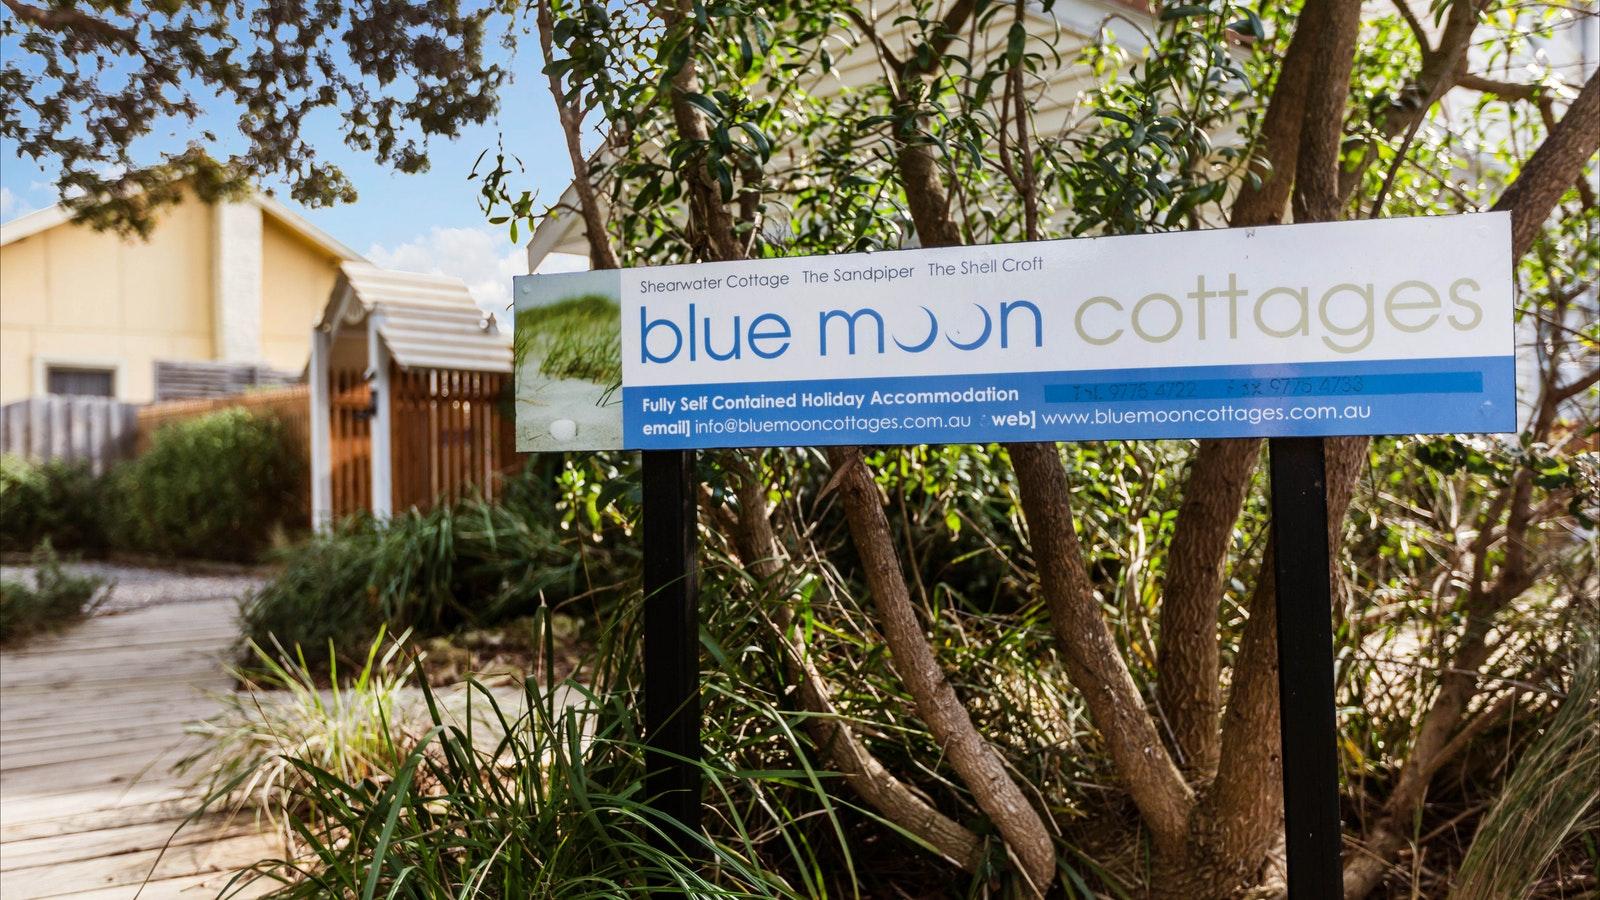 Blue Moon Cottages - Award Winning Accommodation